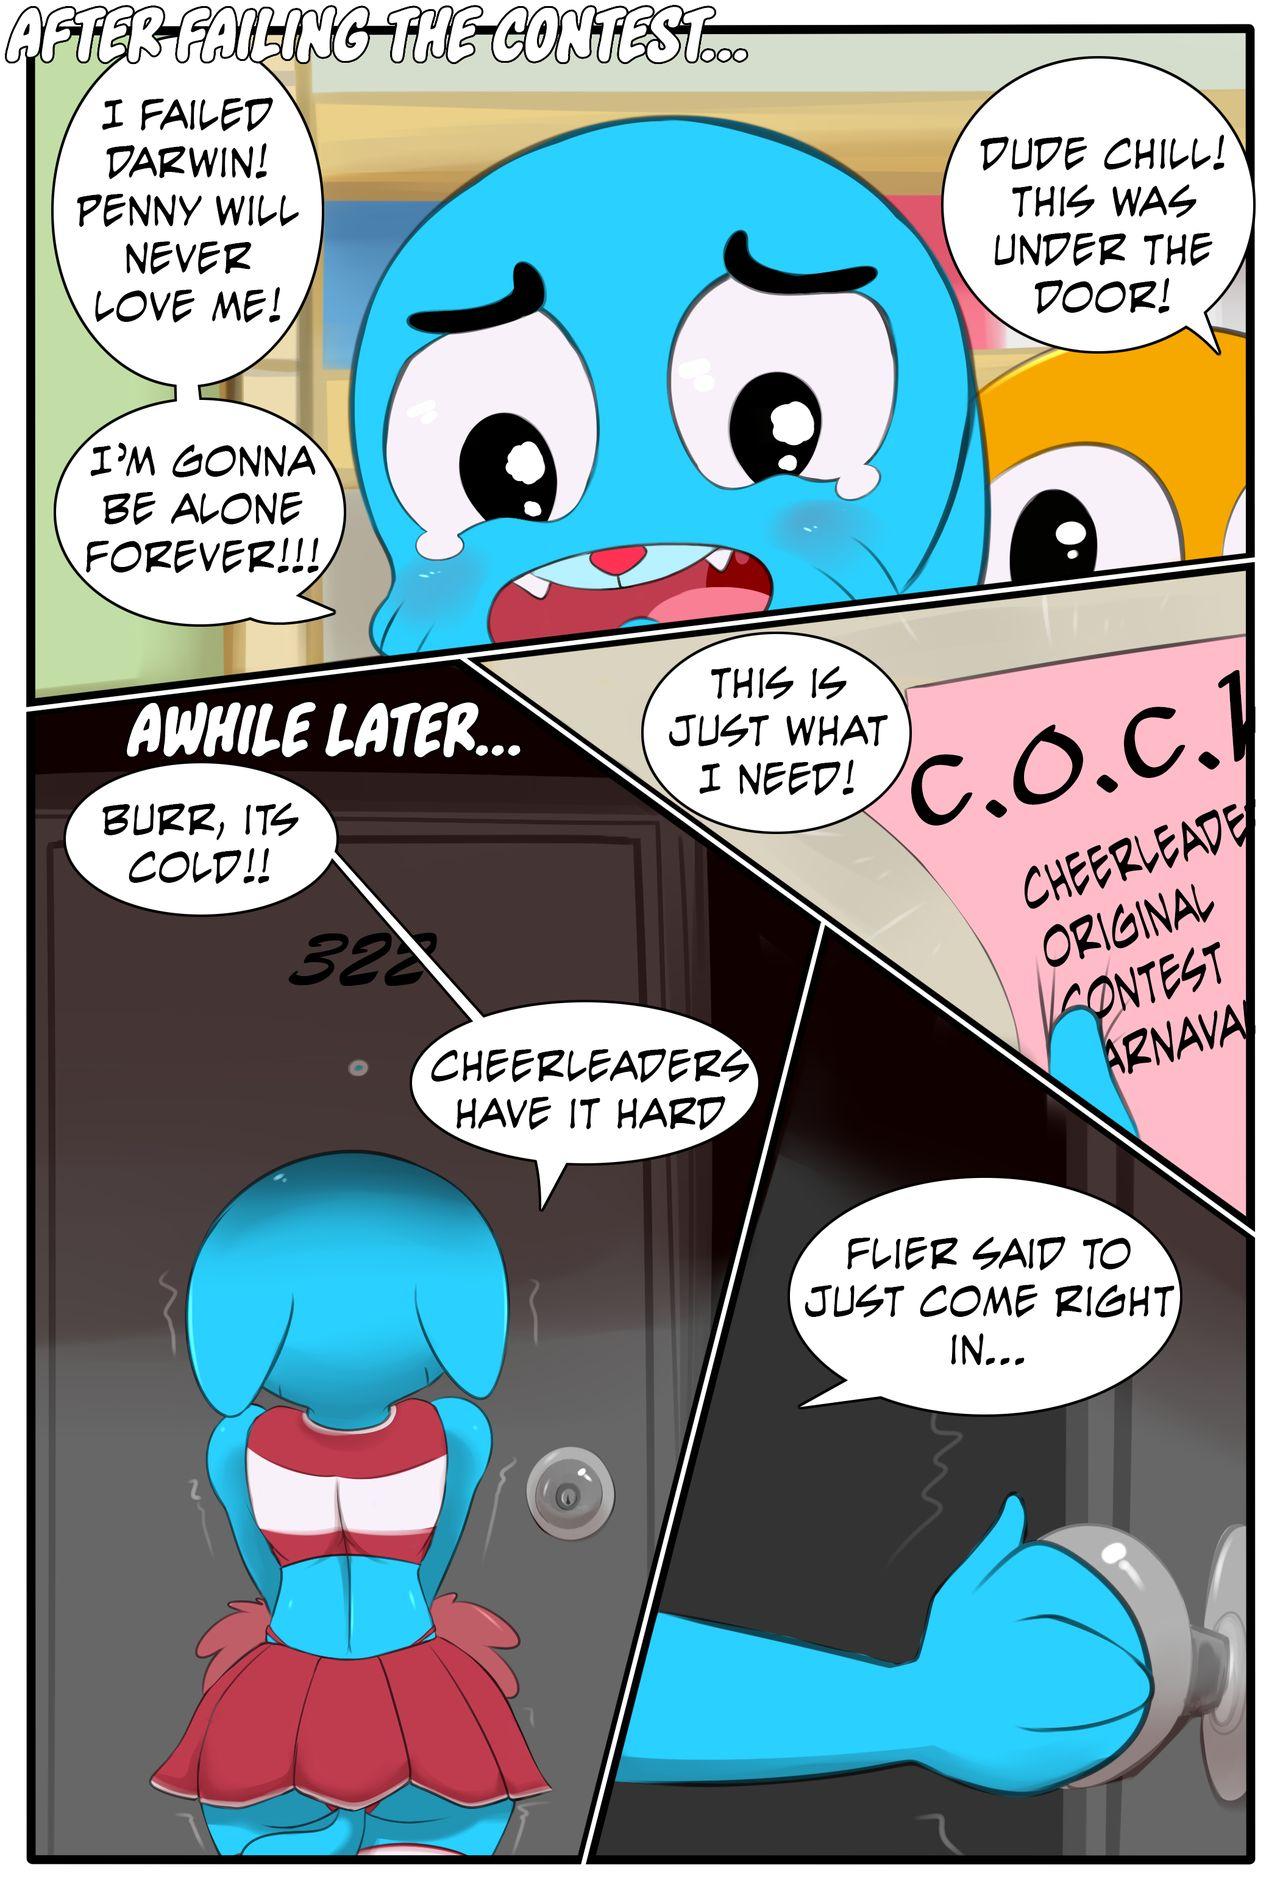 Amazing World Of Gumball Anime Porn Comic the amazing world of gumball - please! cheer me